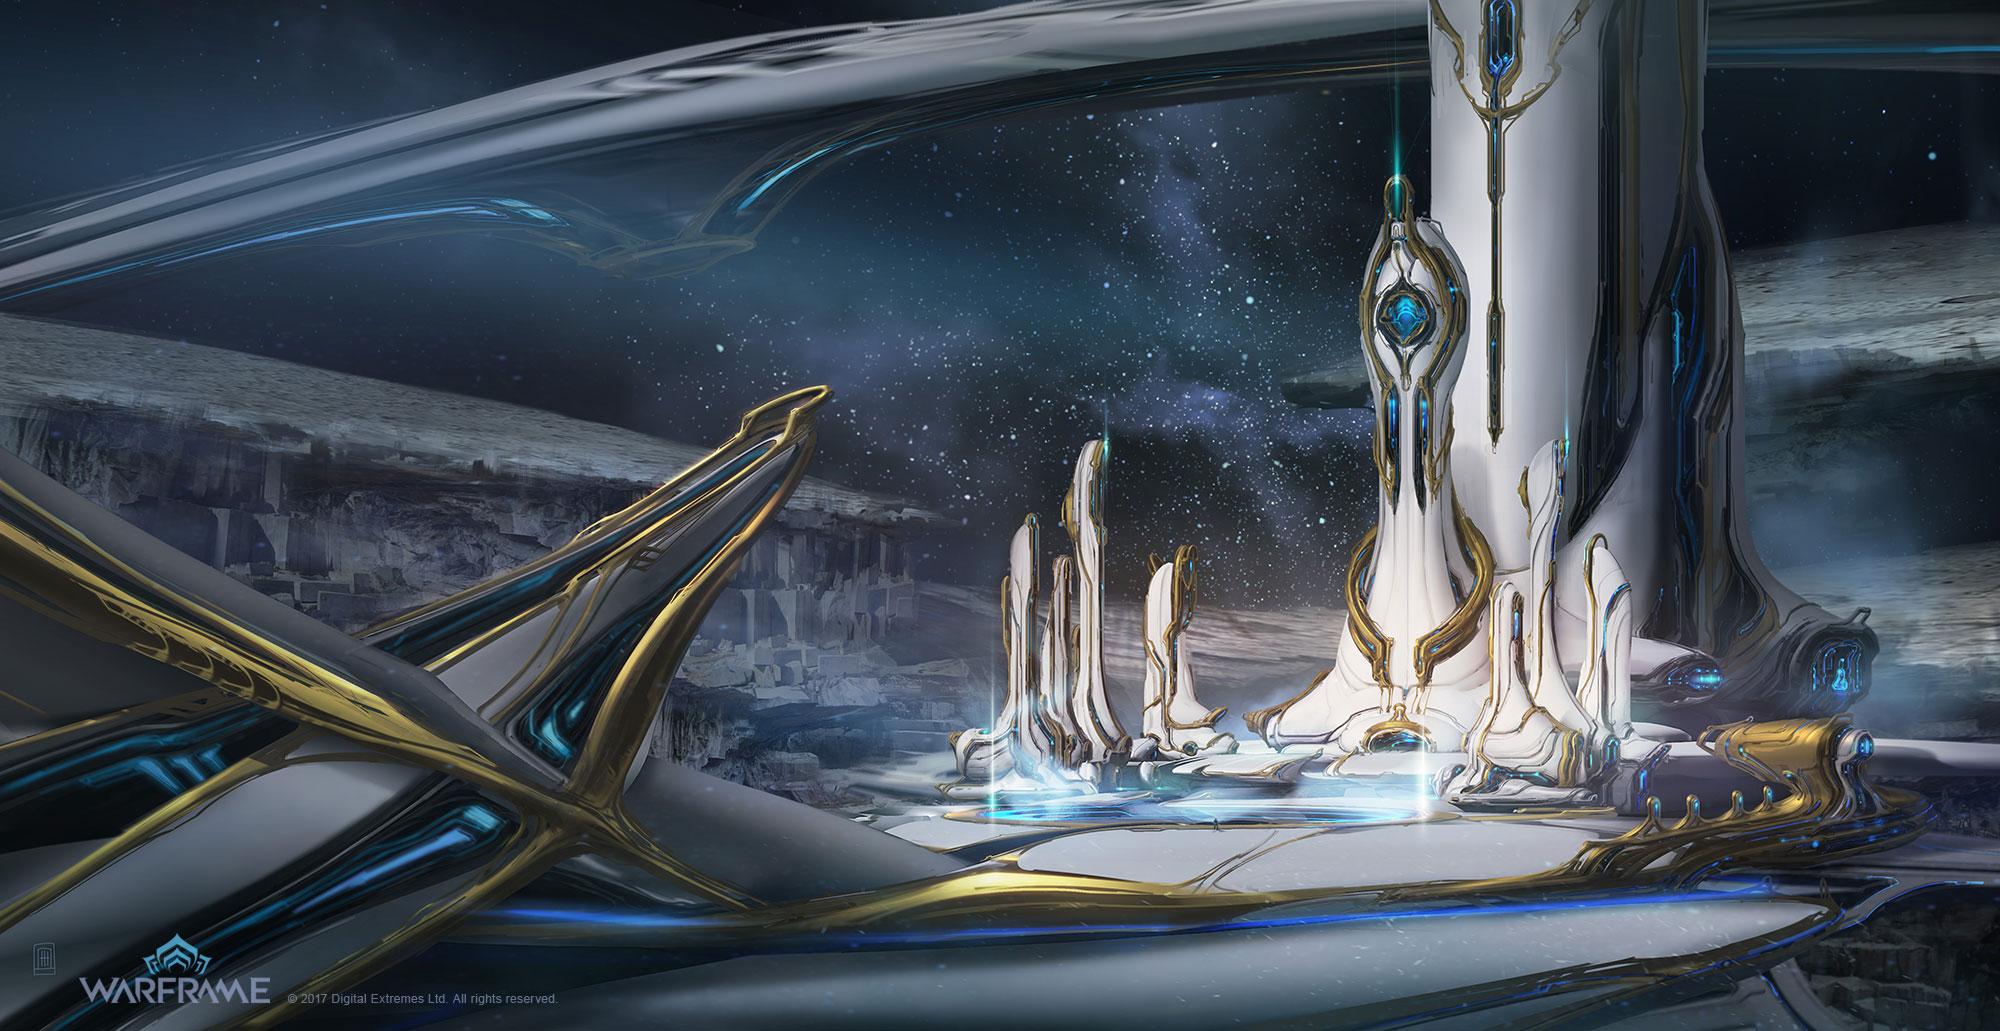 Warframe_Orokin_Moon_MegaStructure_A_01